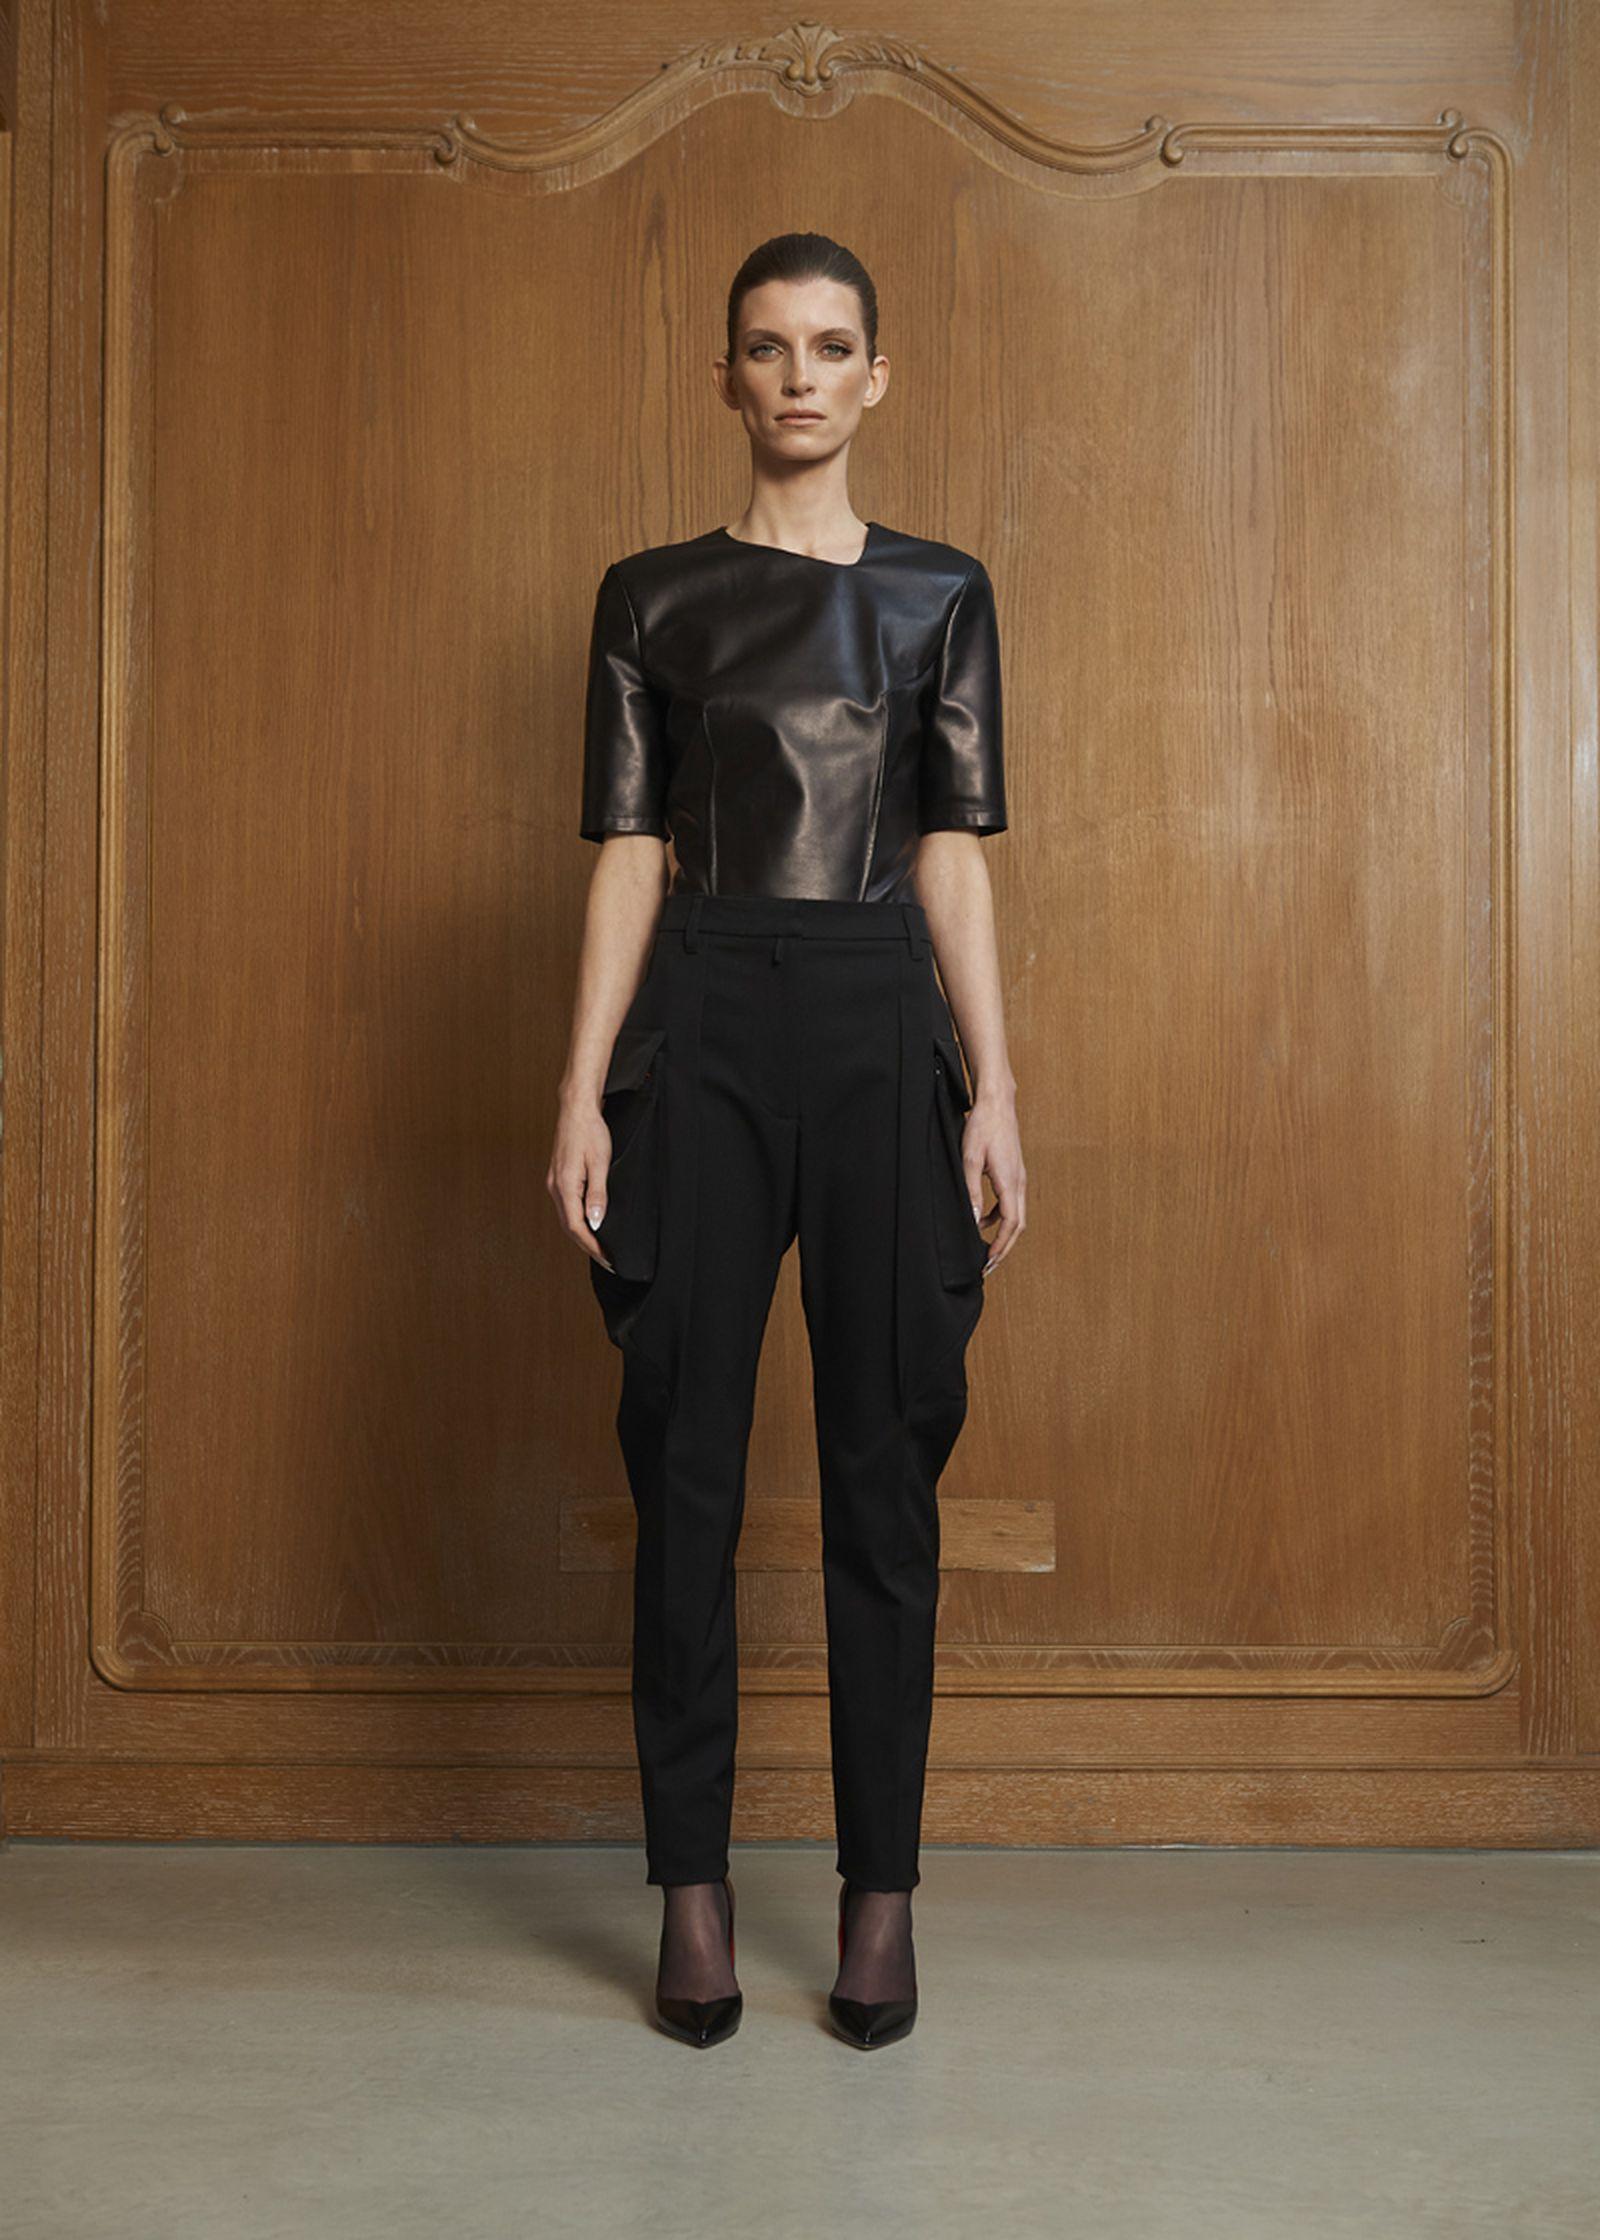 032c-rtw-womenswear-collection-paris-3